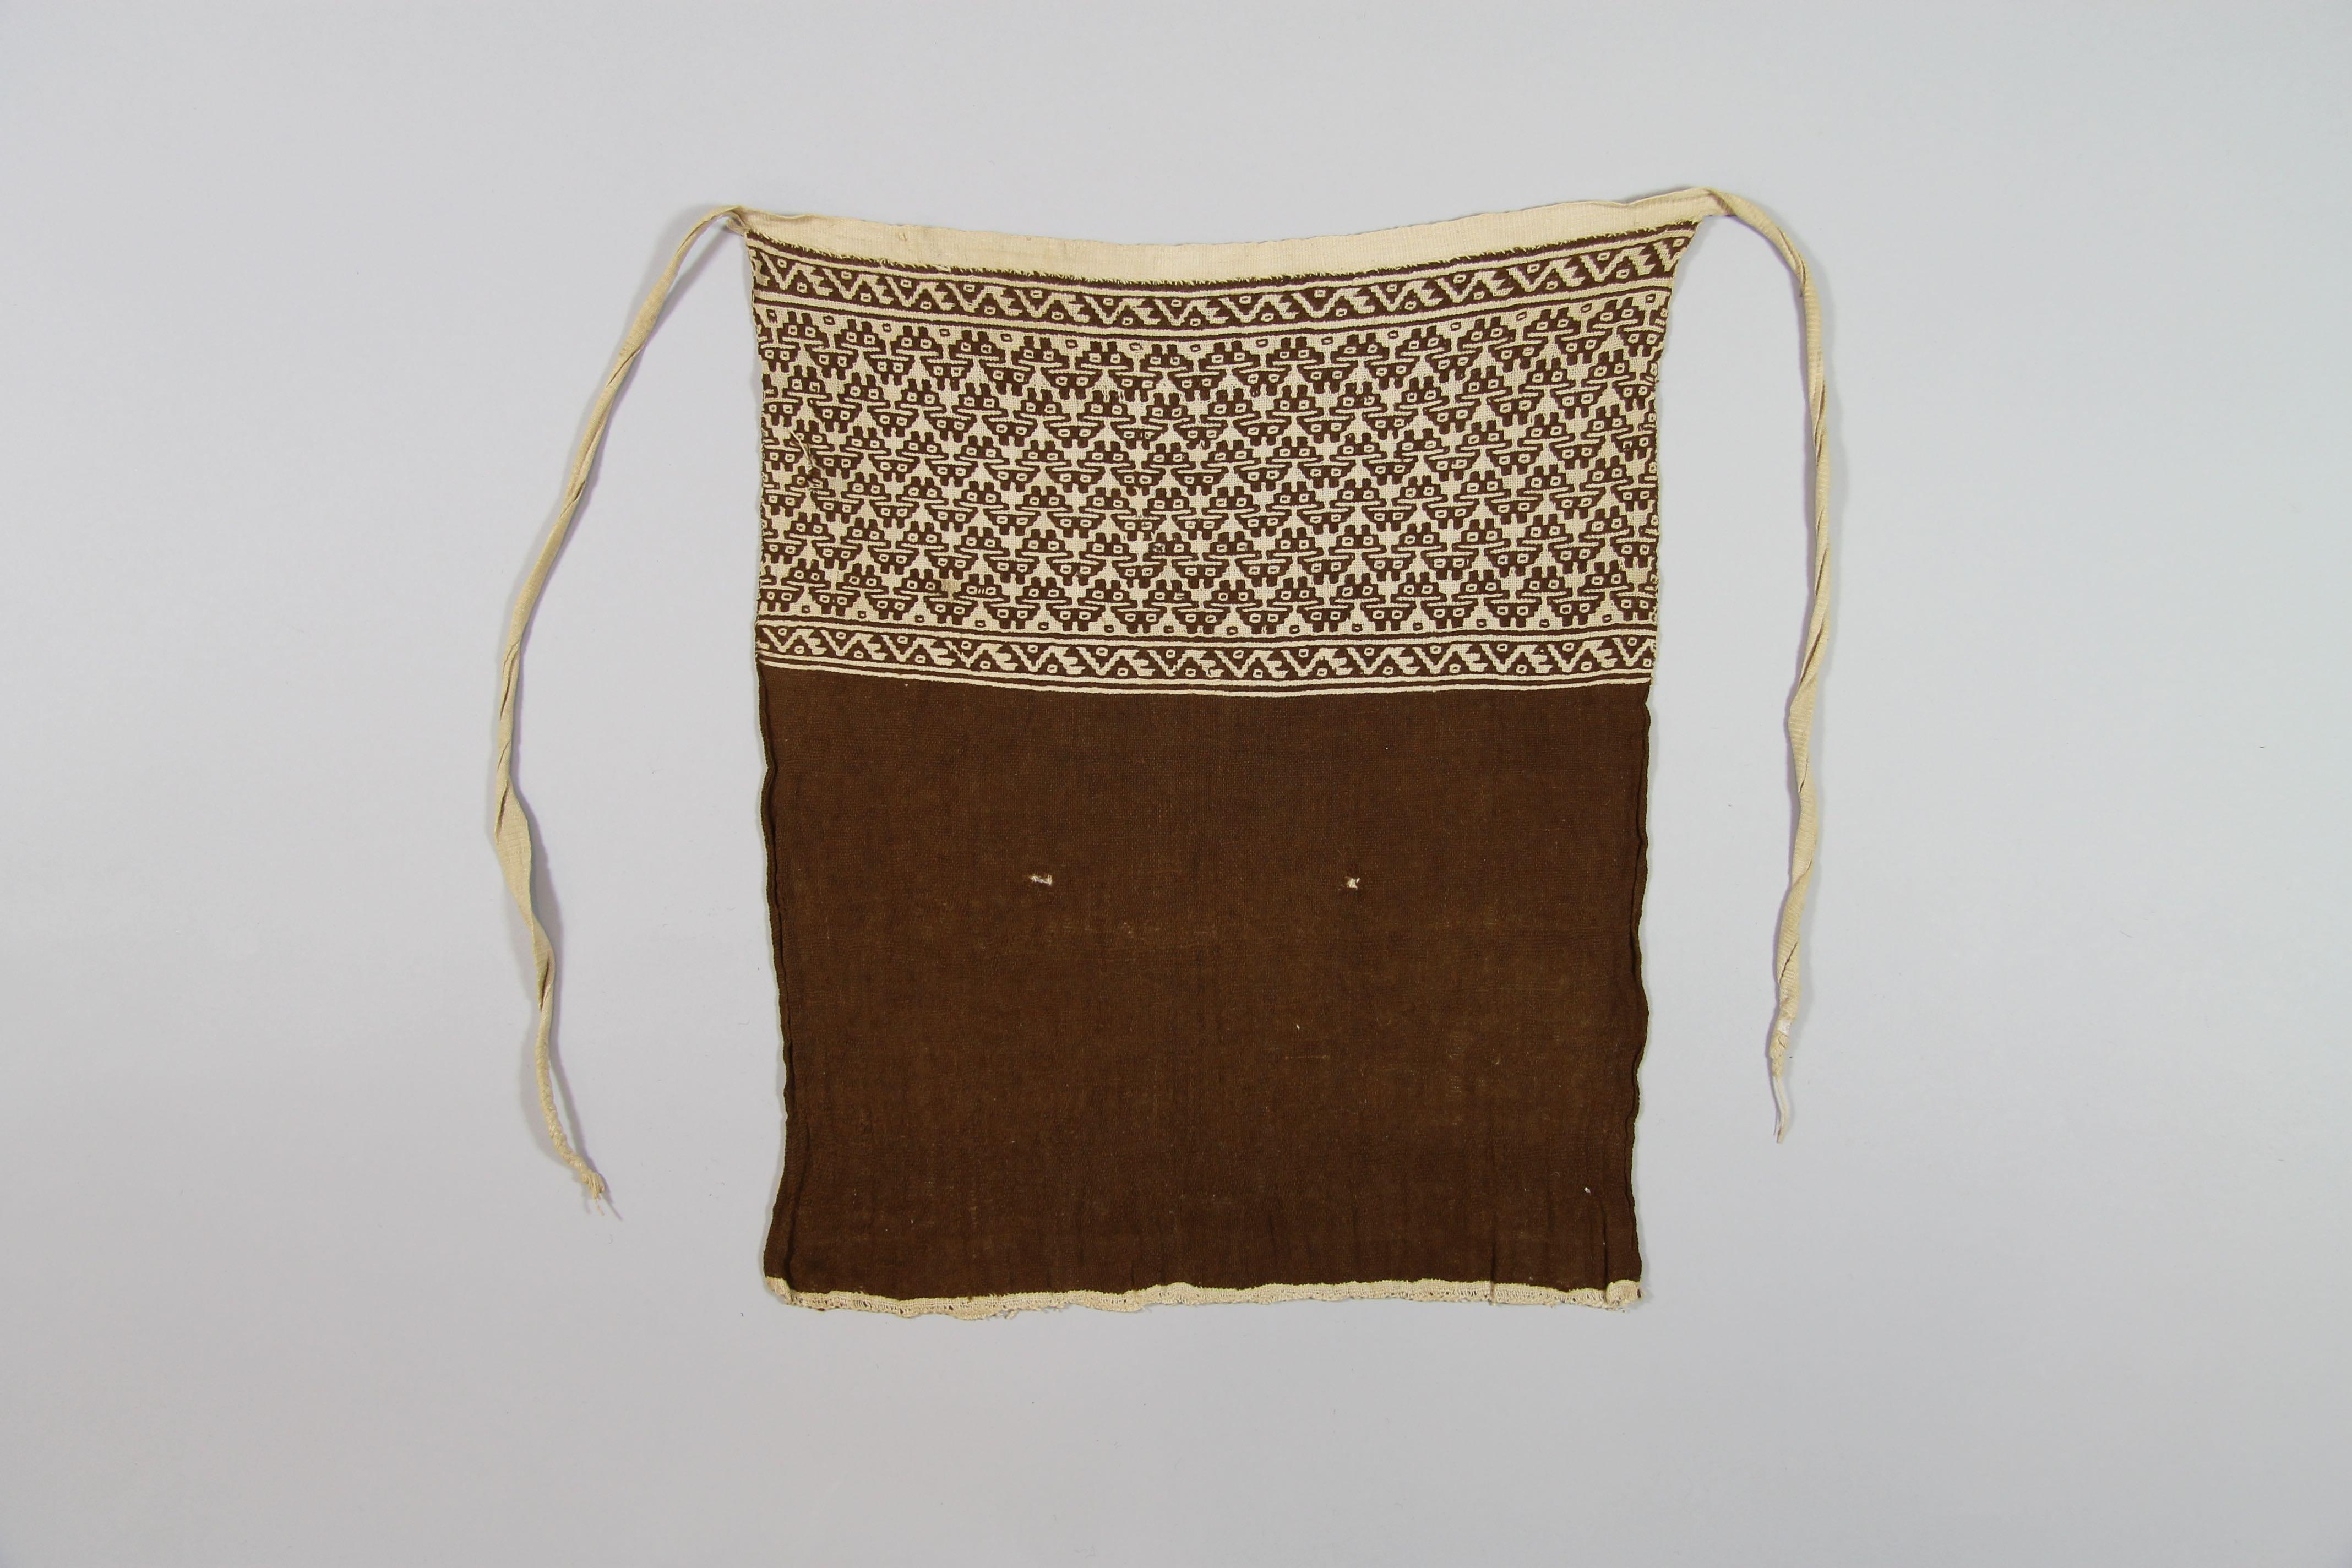 Woven loin cloth